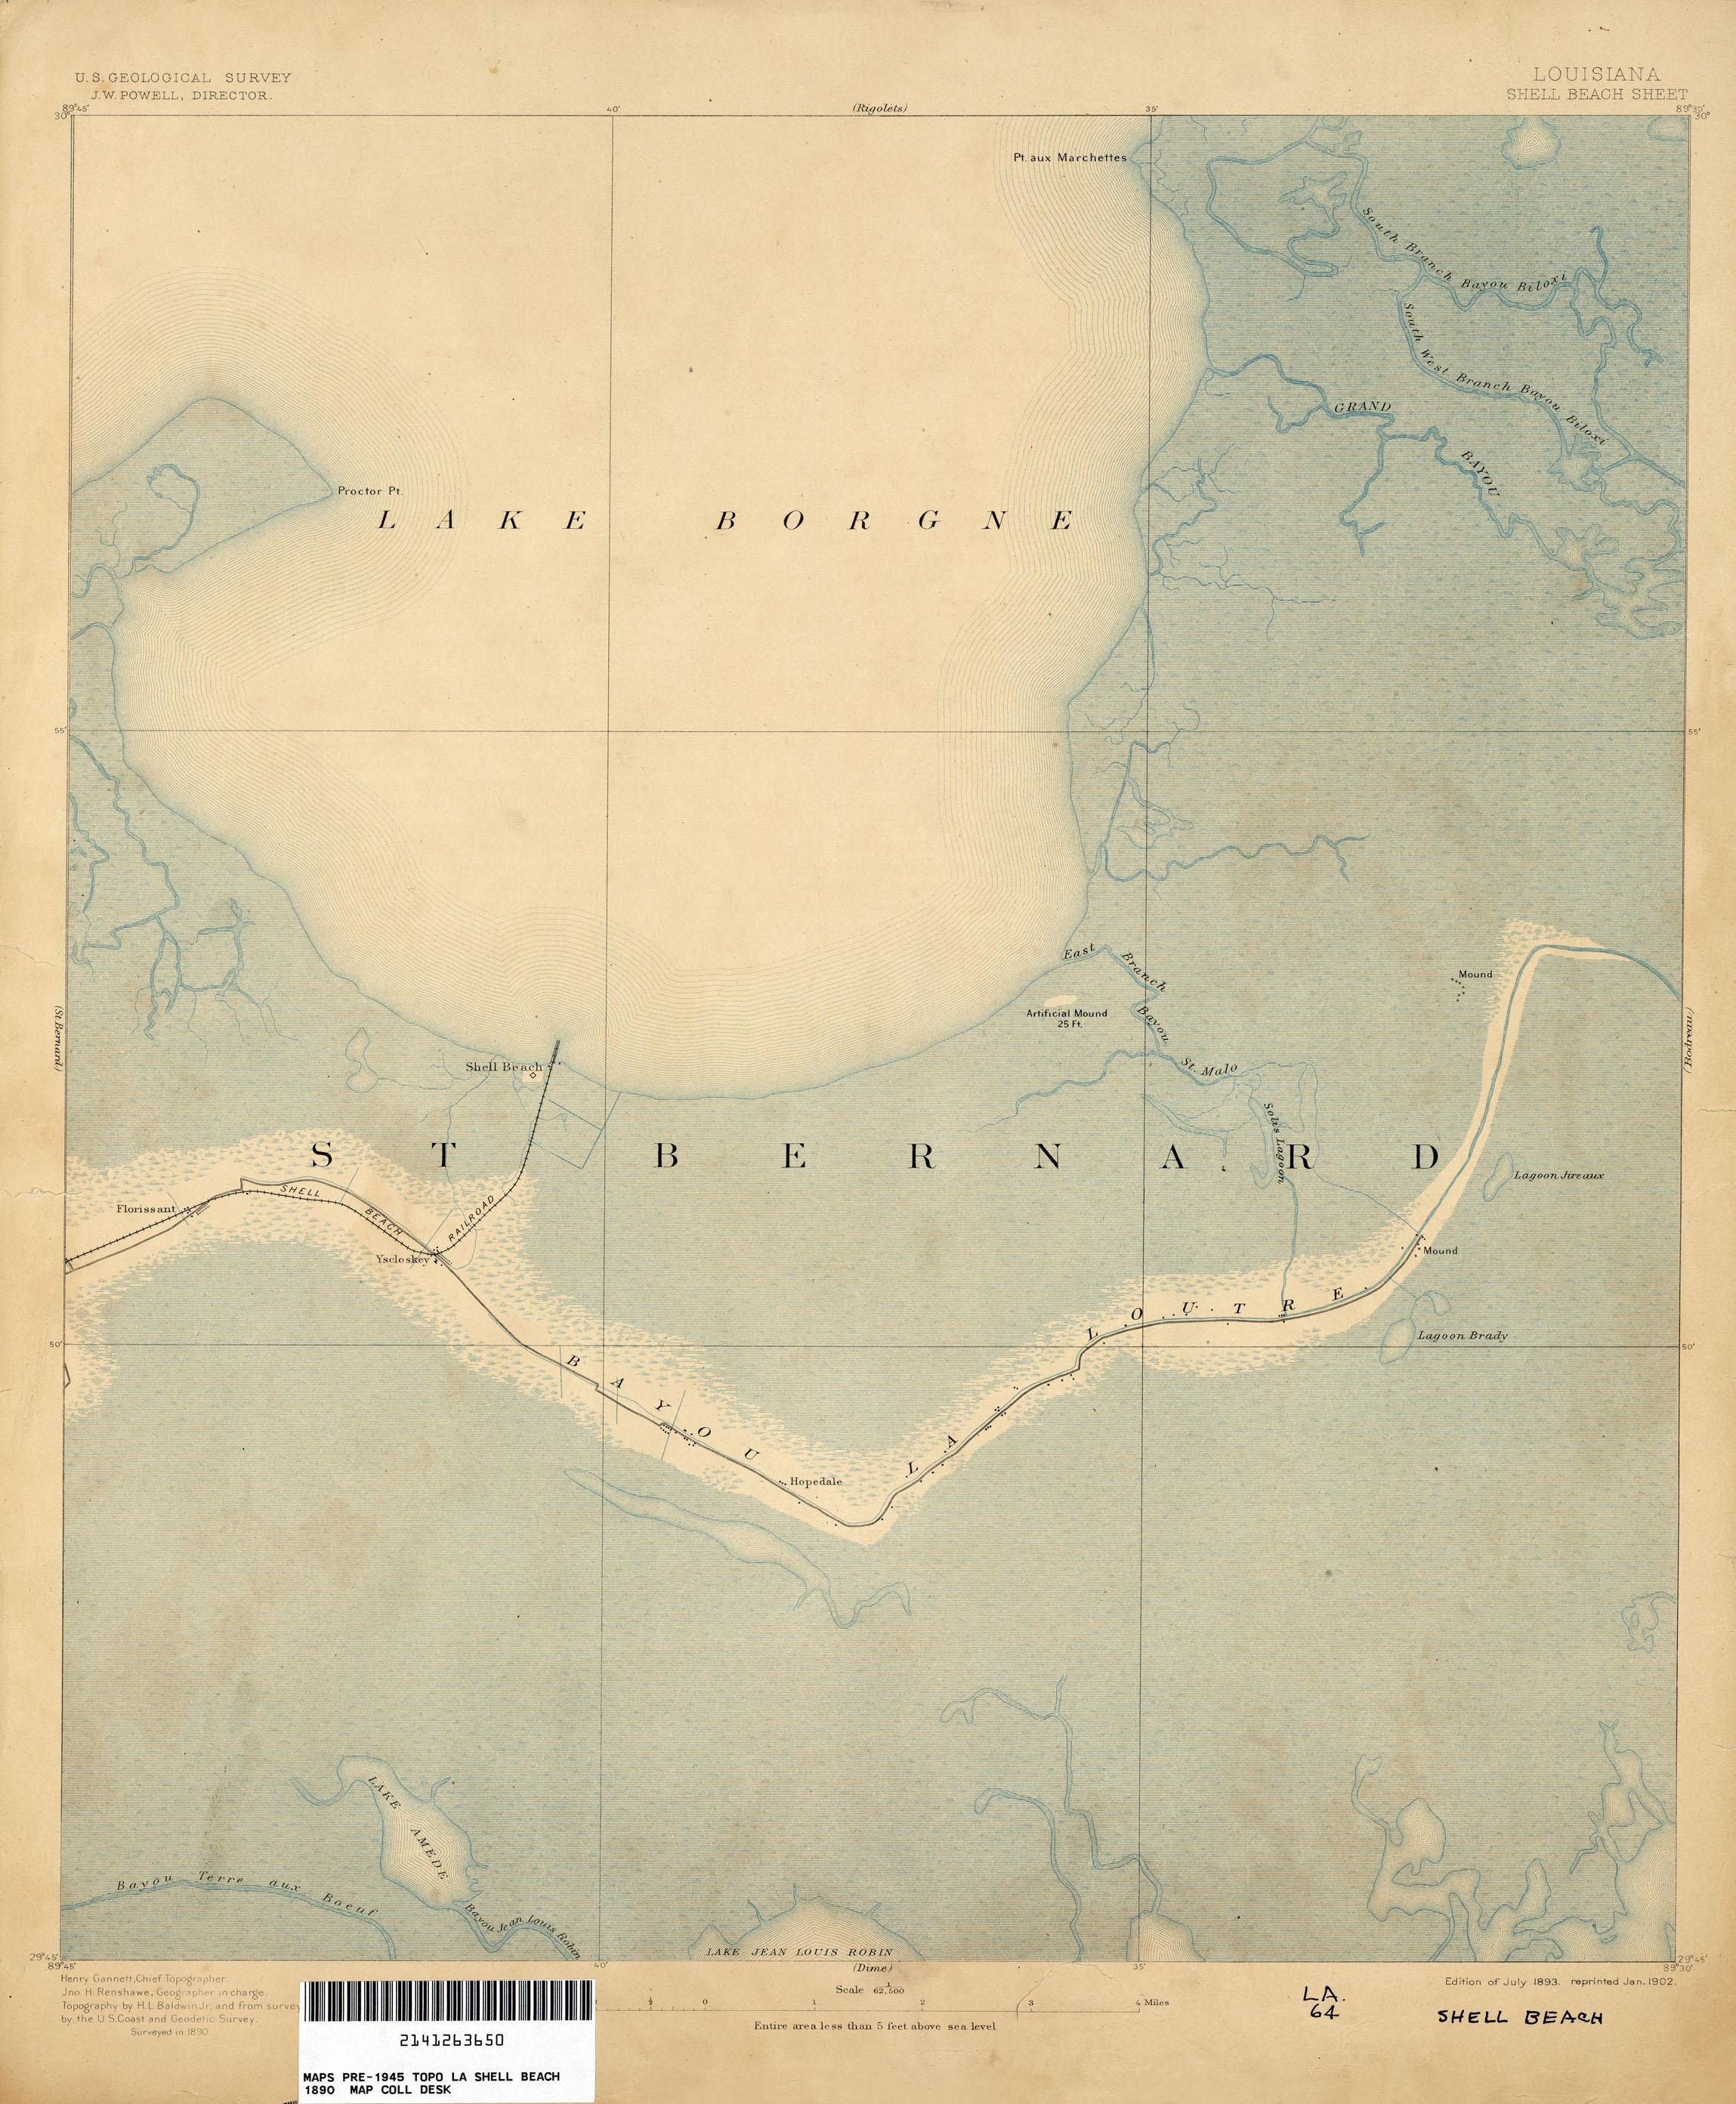 Filest Bernard Shell Beach Map Lake Borgne 1890jpg Wikimedia Commons - Map-of-the-us-in-1890